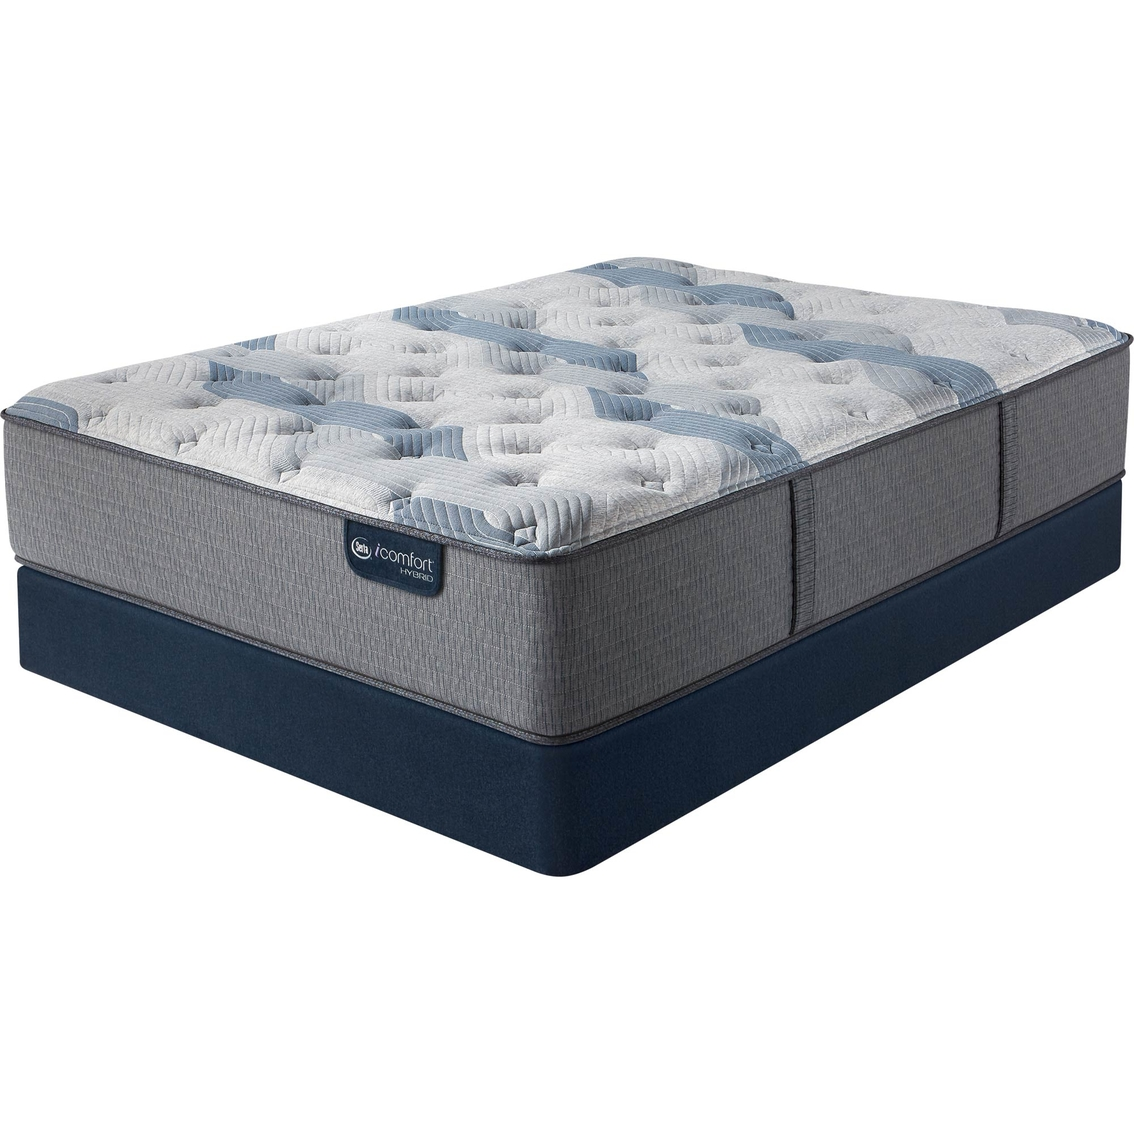 Serta Icomfort Hybrid Blue Fusion 100 Firm Mattress Set